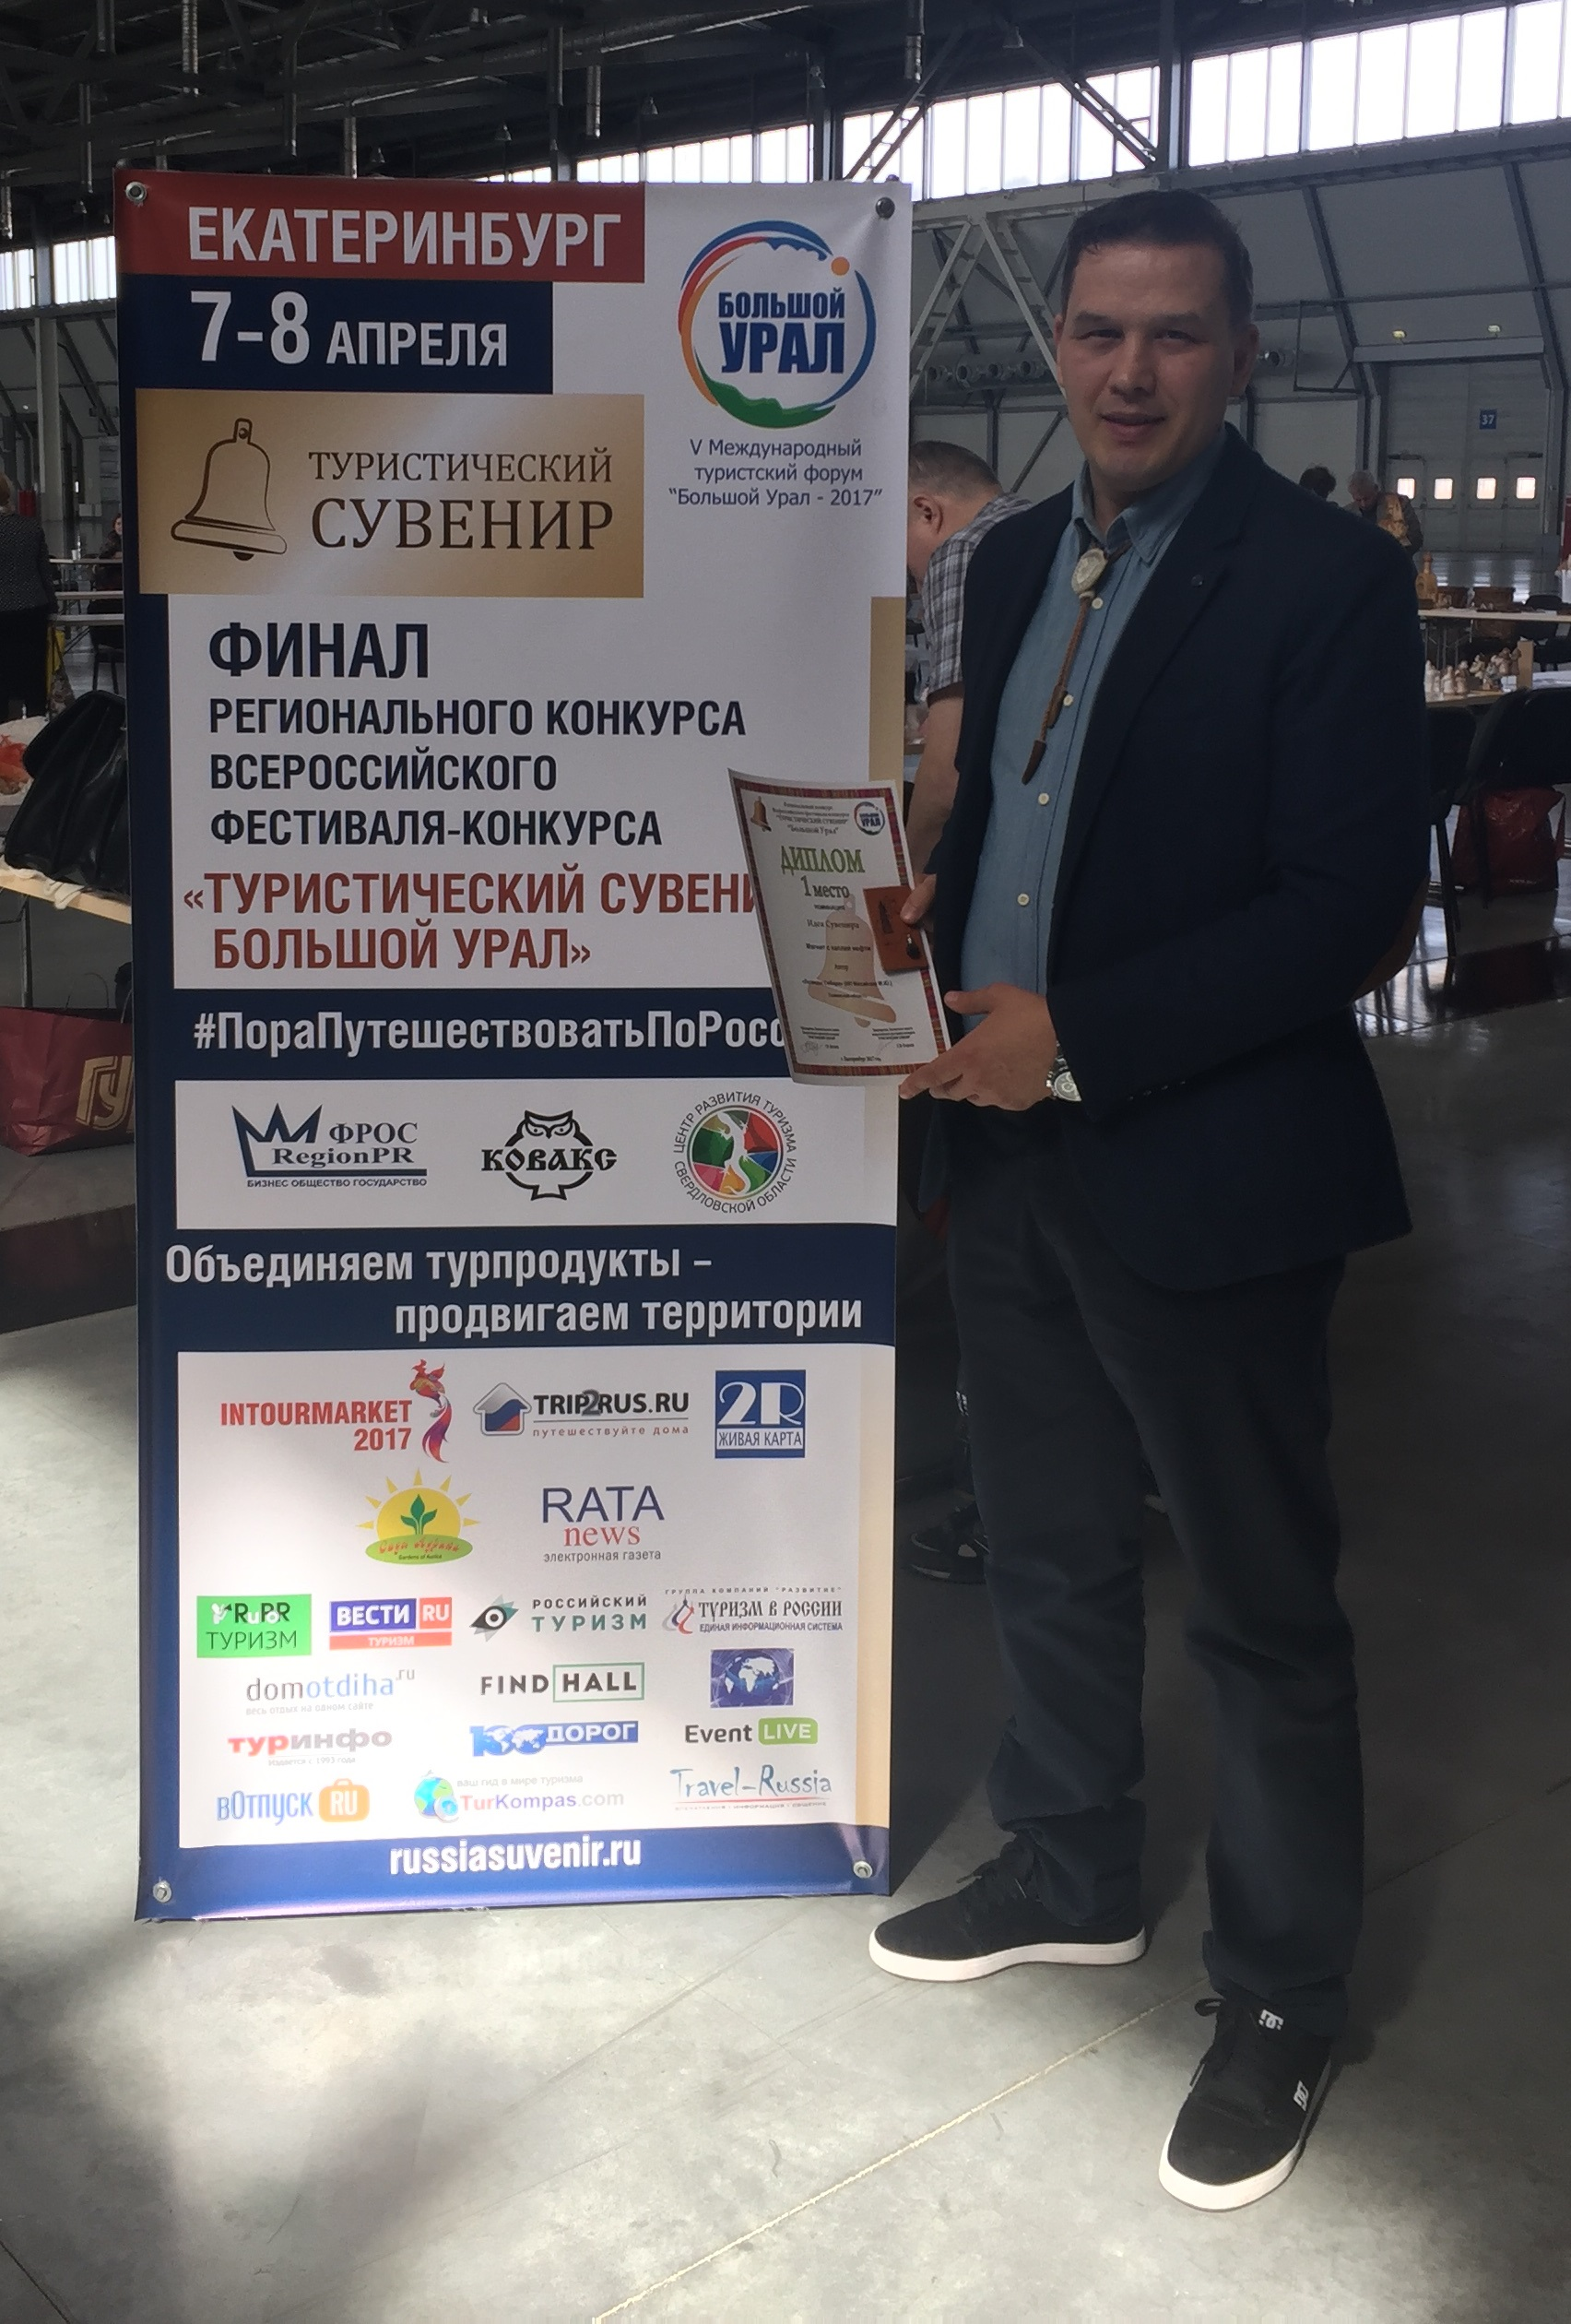 Михаил Михайлов, Легенды Сибири, туристический сувенир, сувенир из тюмени, магазинр сувениров